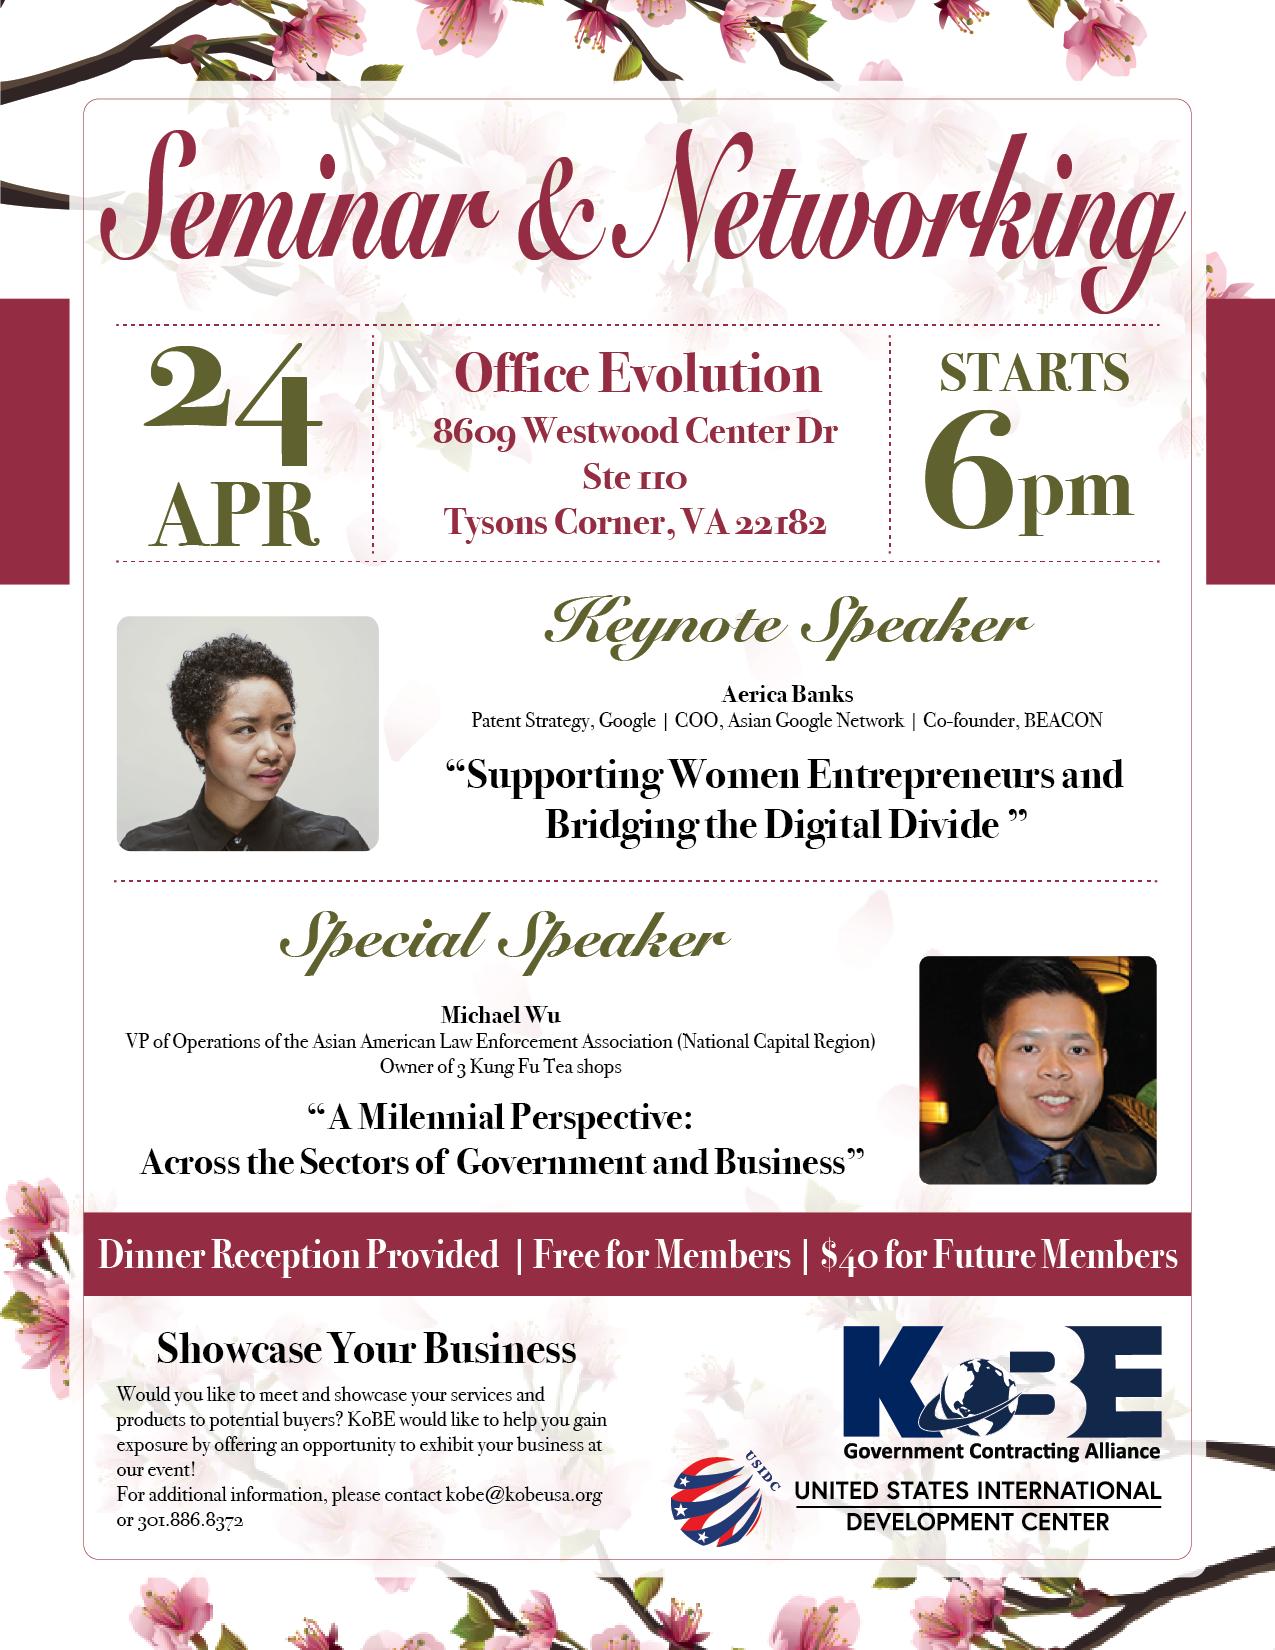 seminar and networking